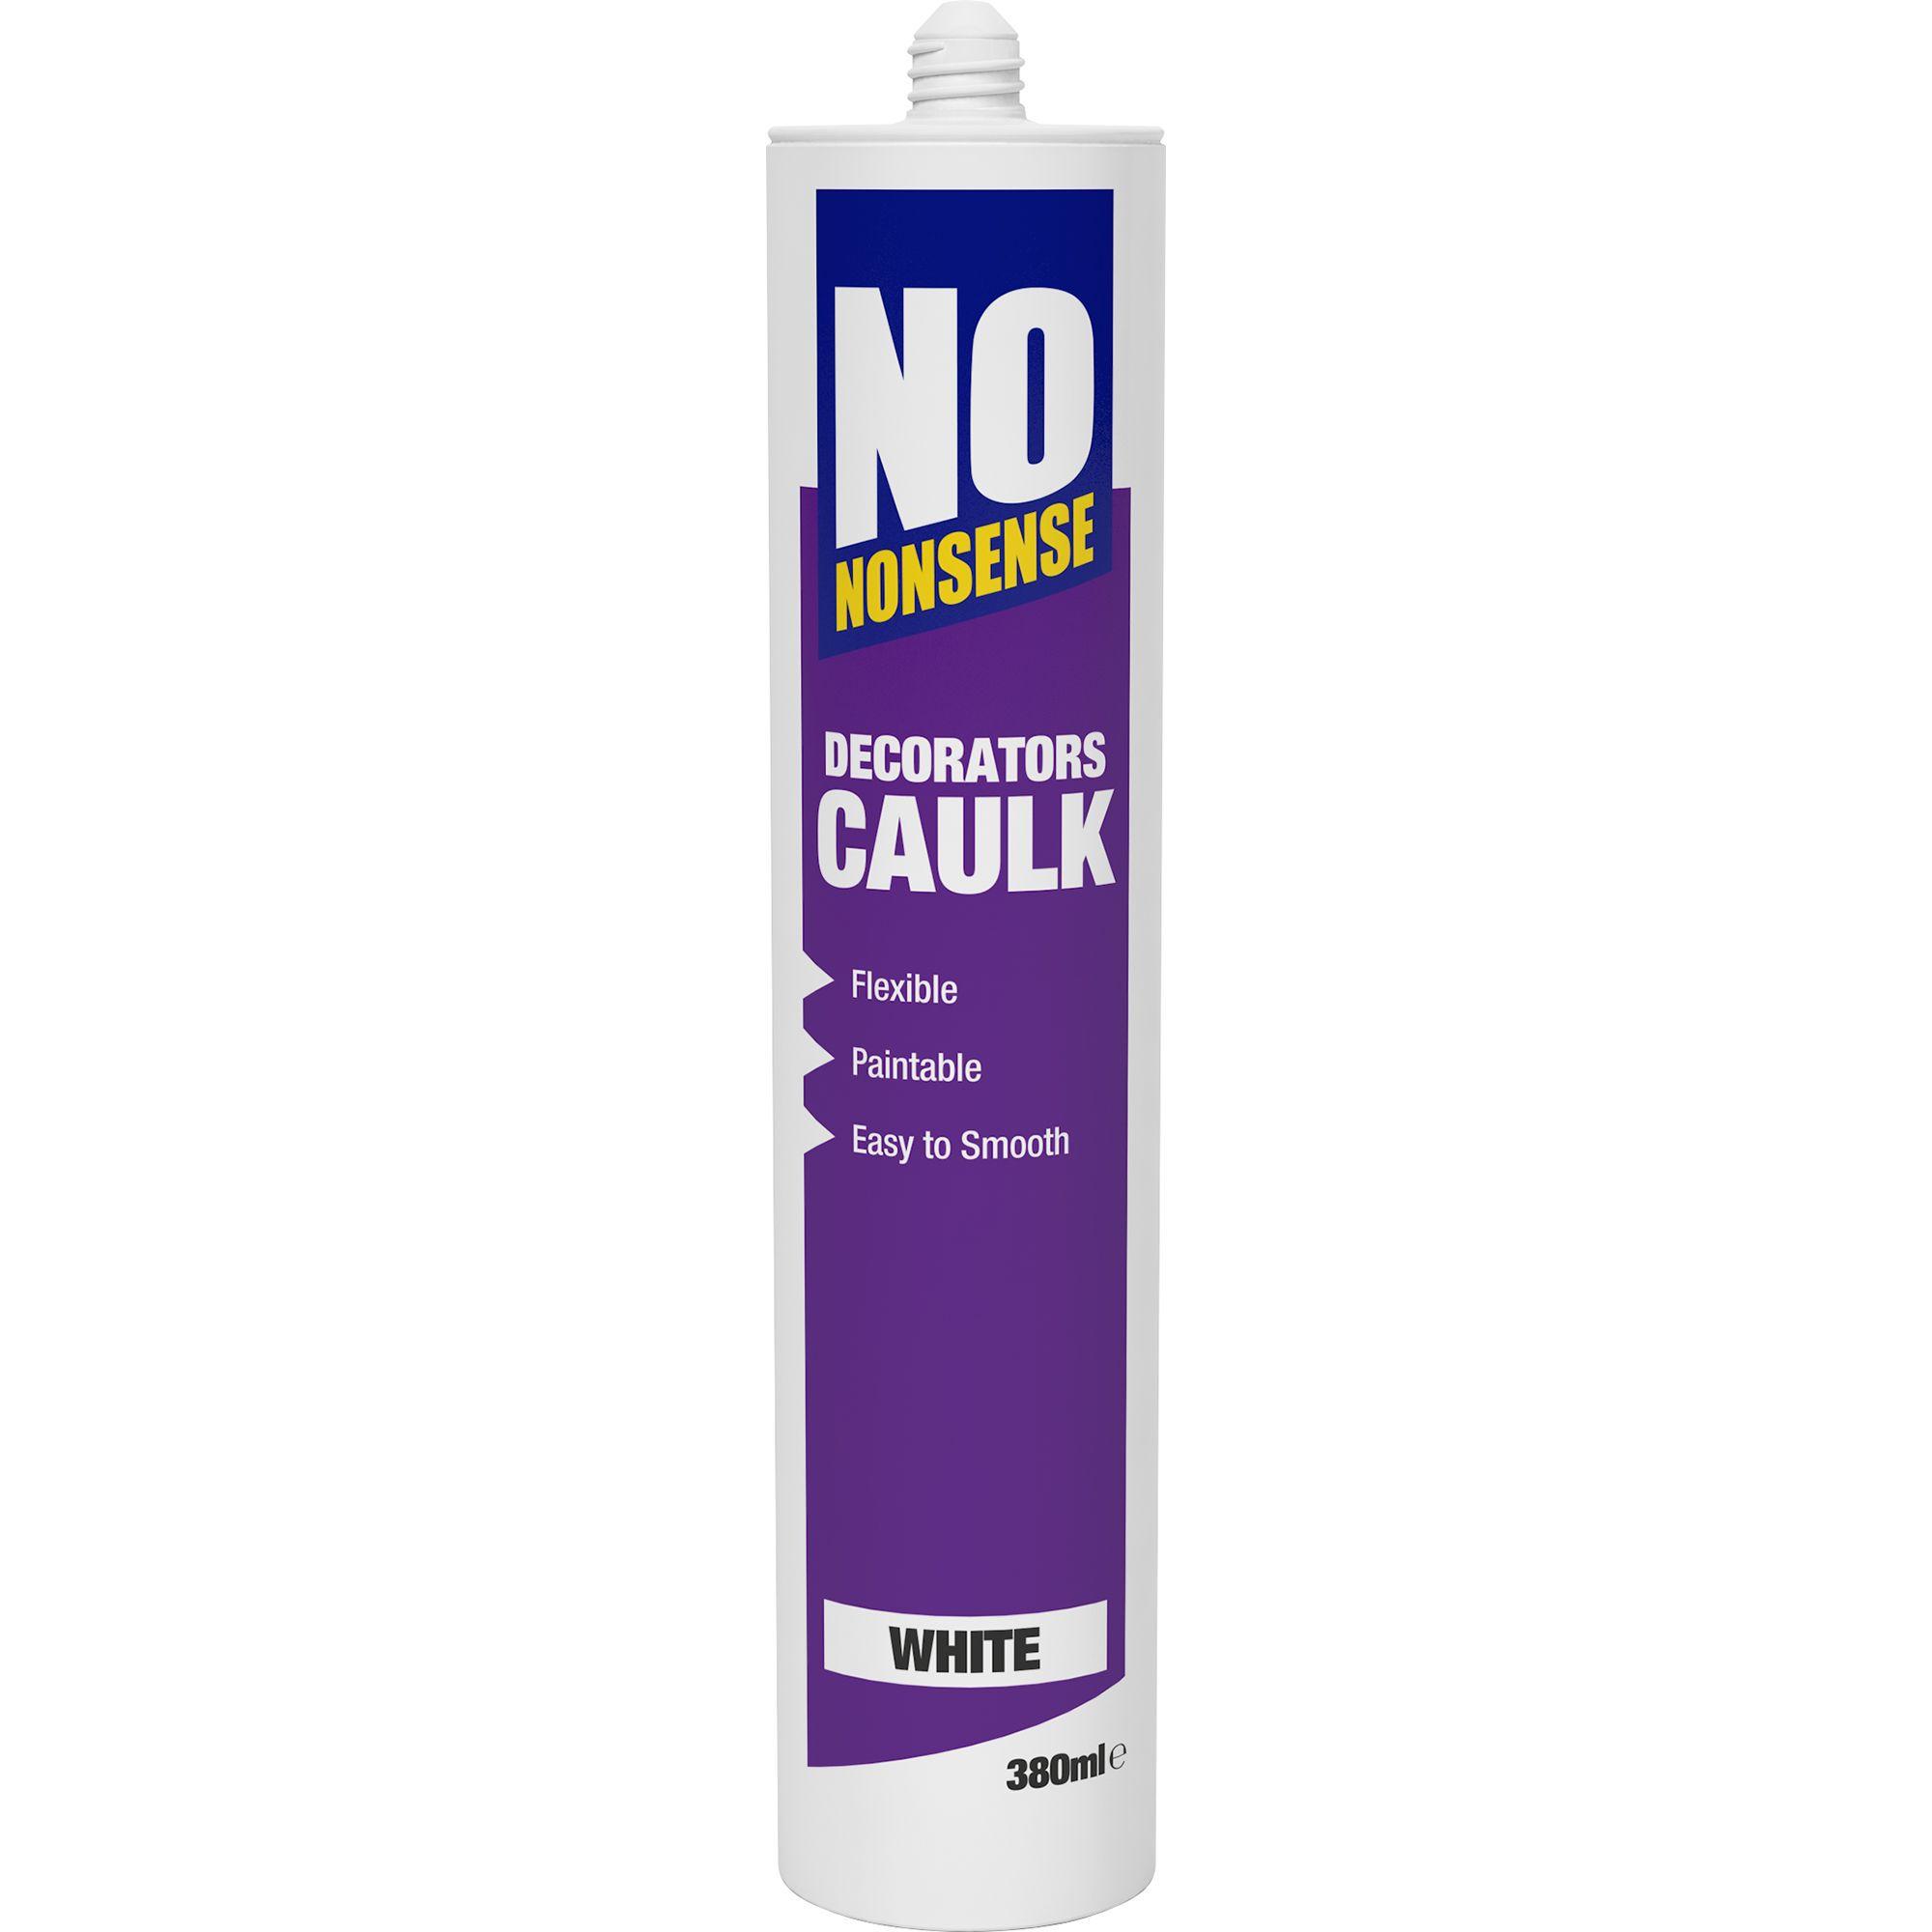 How Long Does Caulking Take To Dry In A Bathroom no nonsense 380ml white decorators caulk | departments | diy at b&q